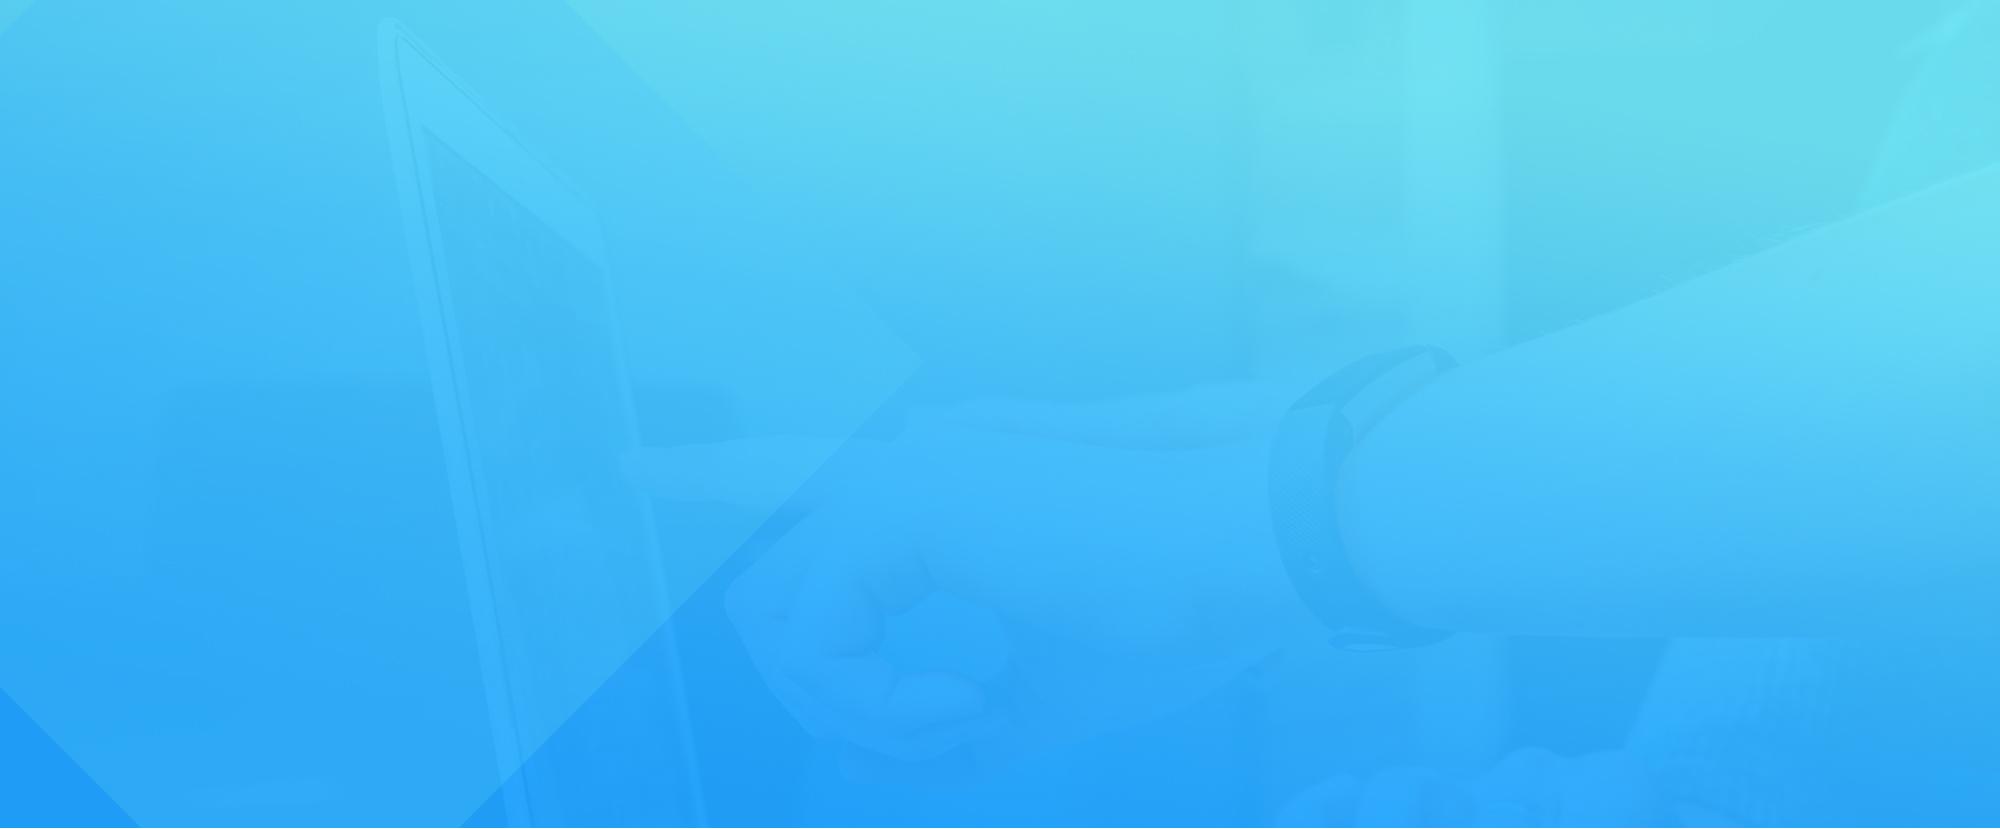 banner-hd-1